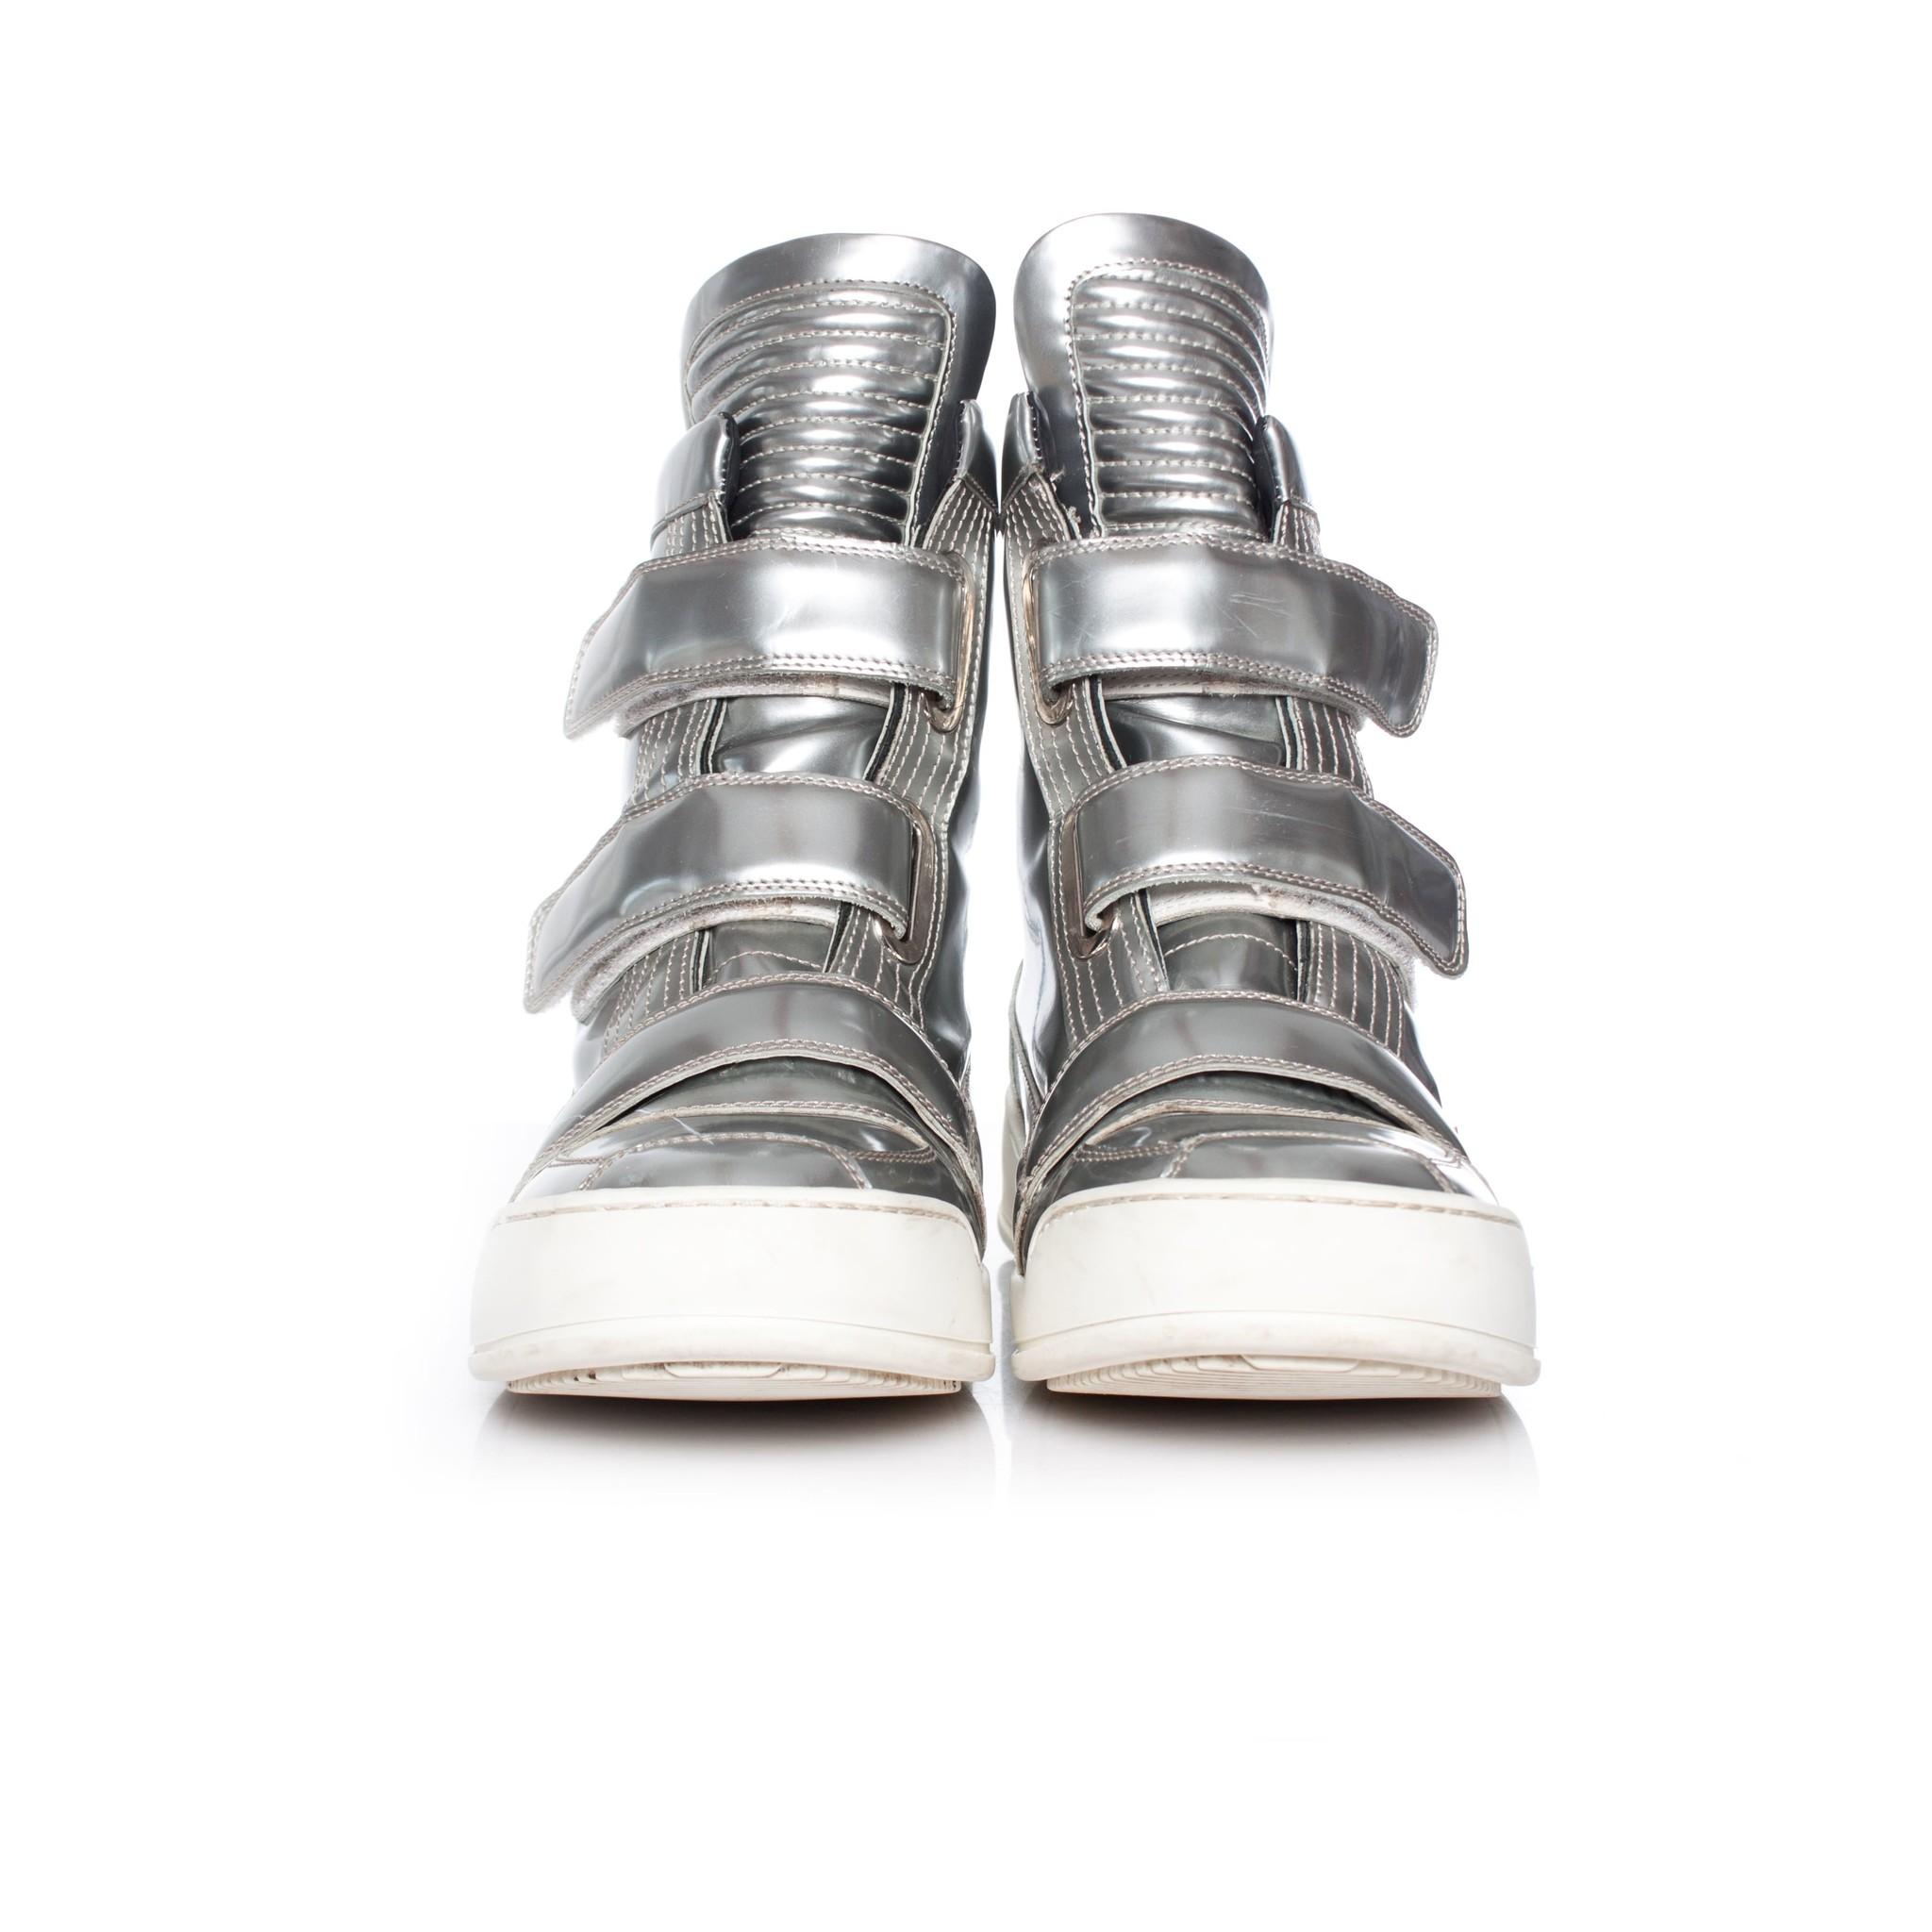 Balmain, Metallic high top sneakers